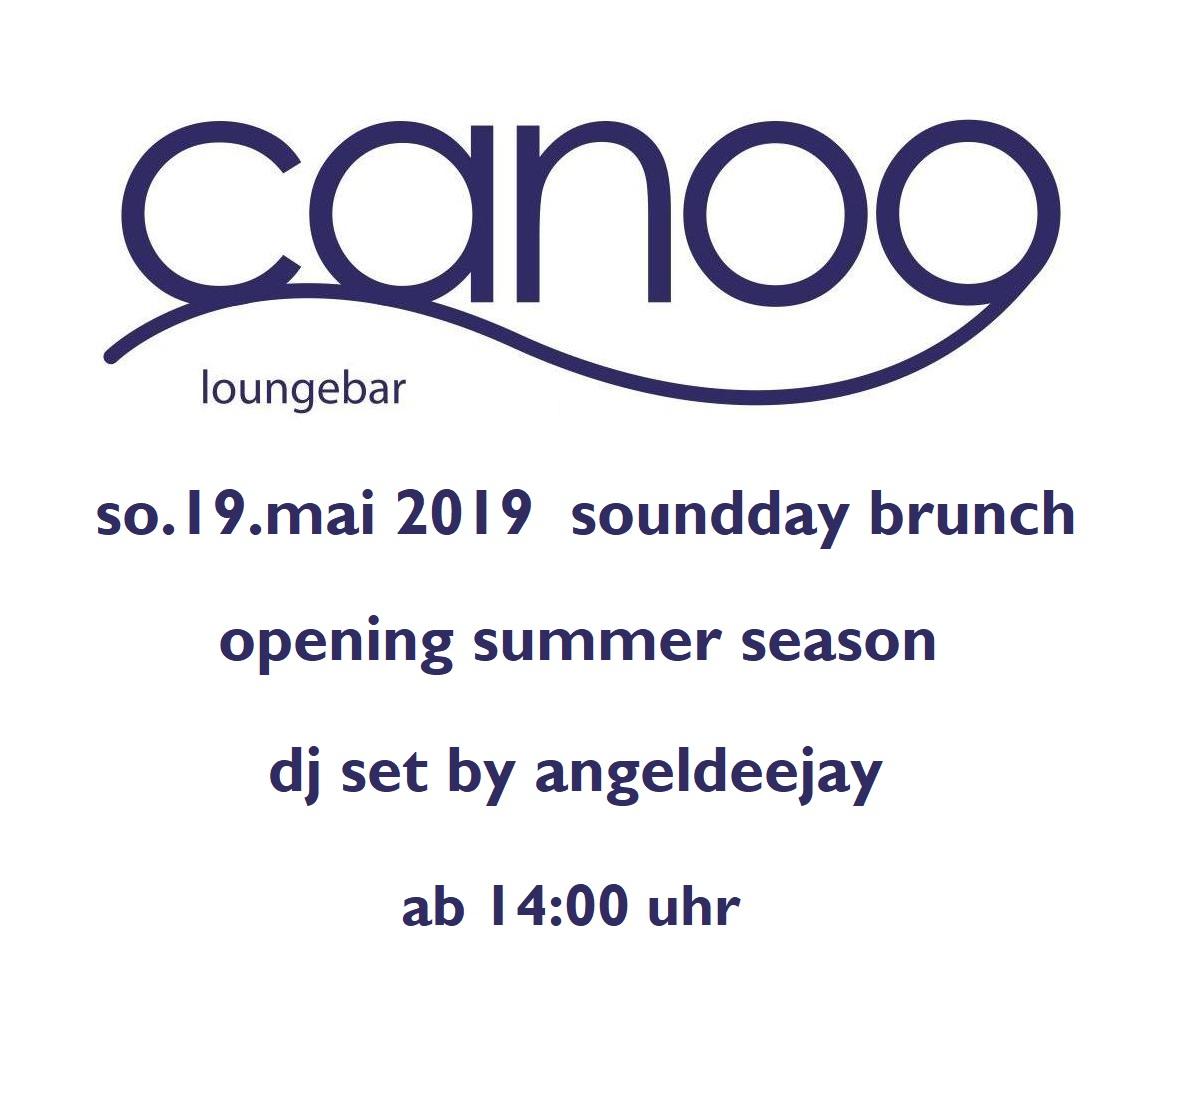 flyer CANOO opening season 2019